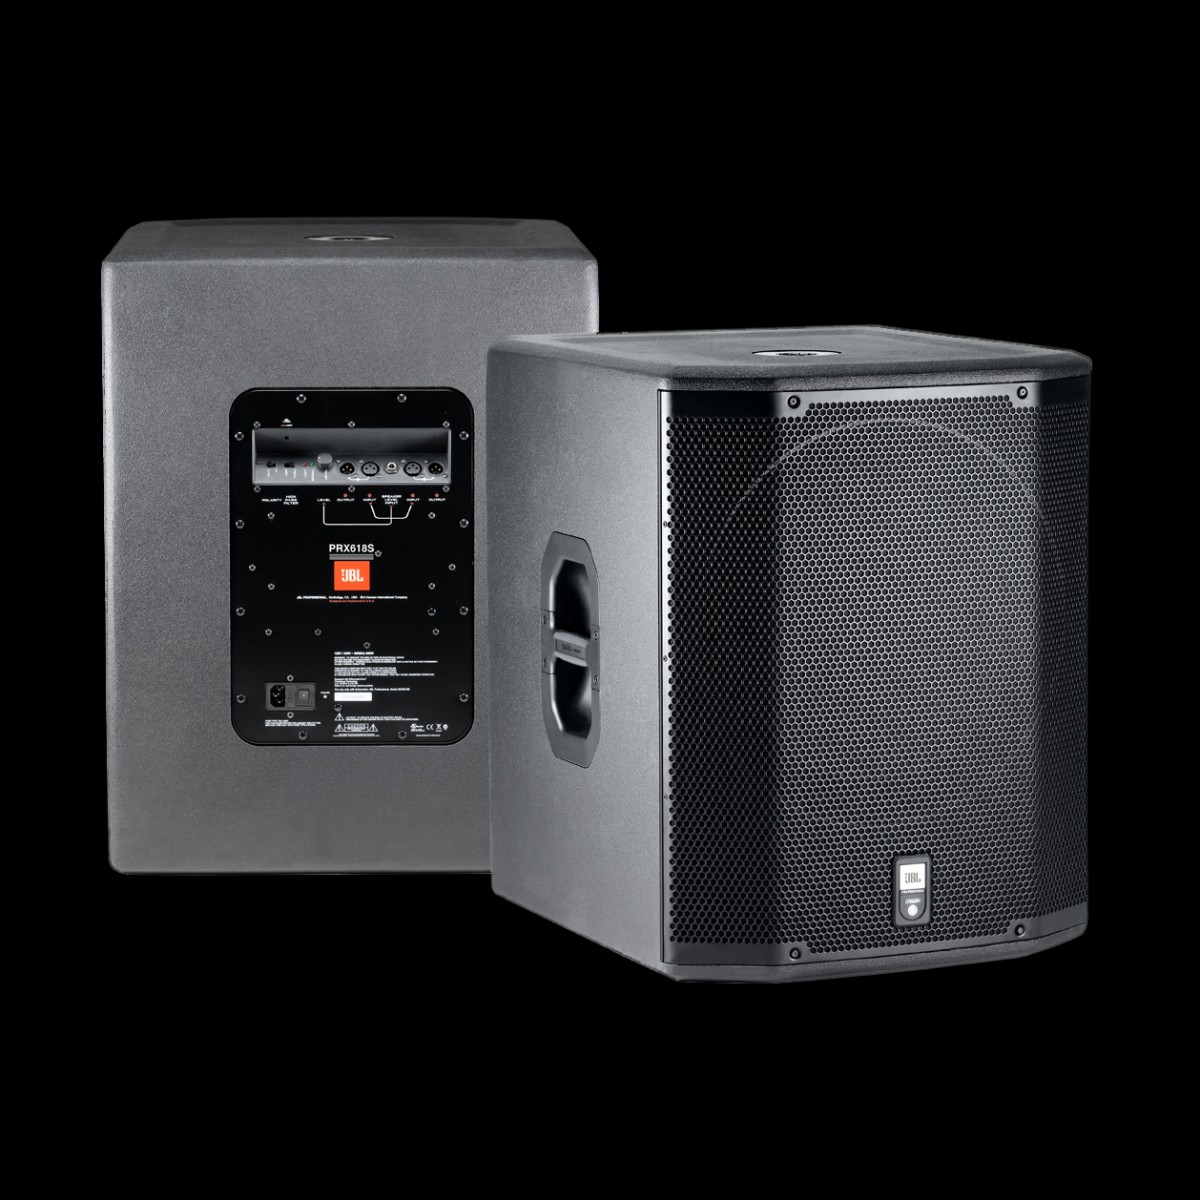 jbl prx 600 prx618 s grille voor luidsprekerhoes strongline